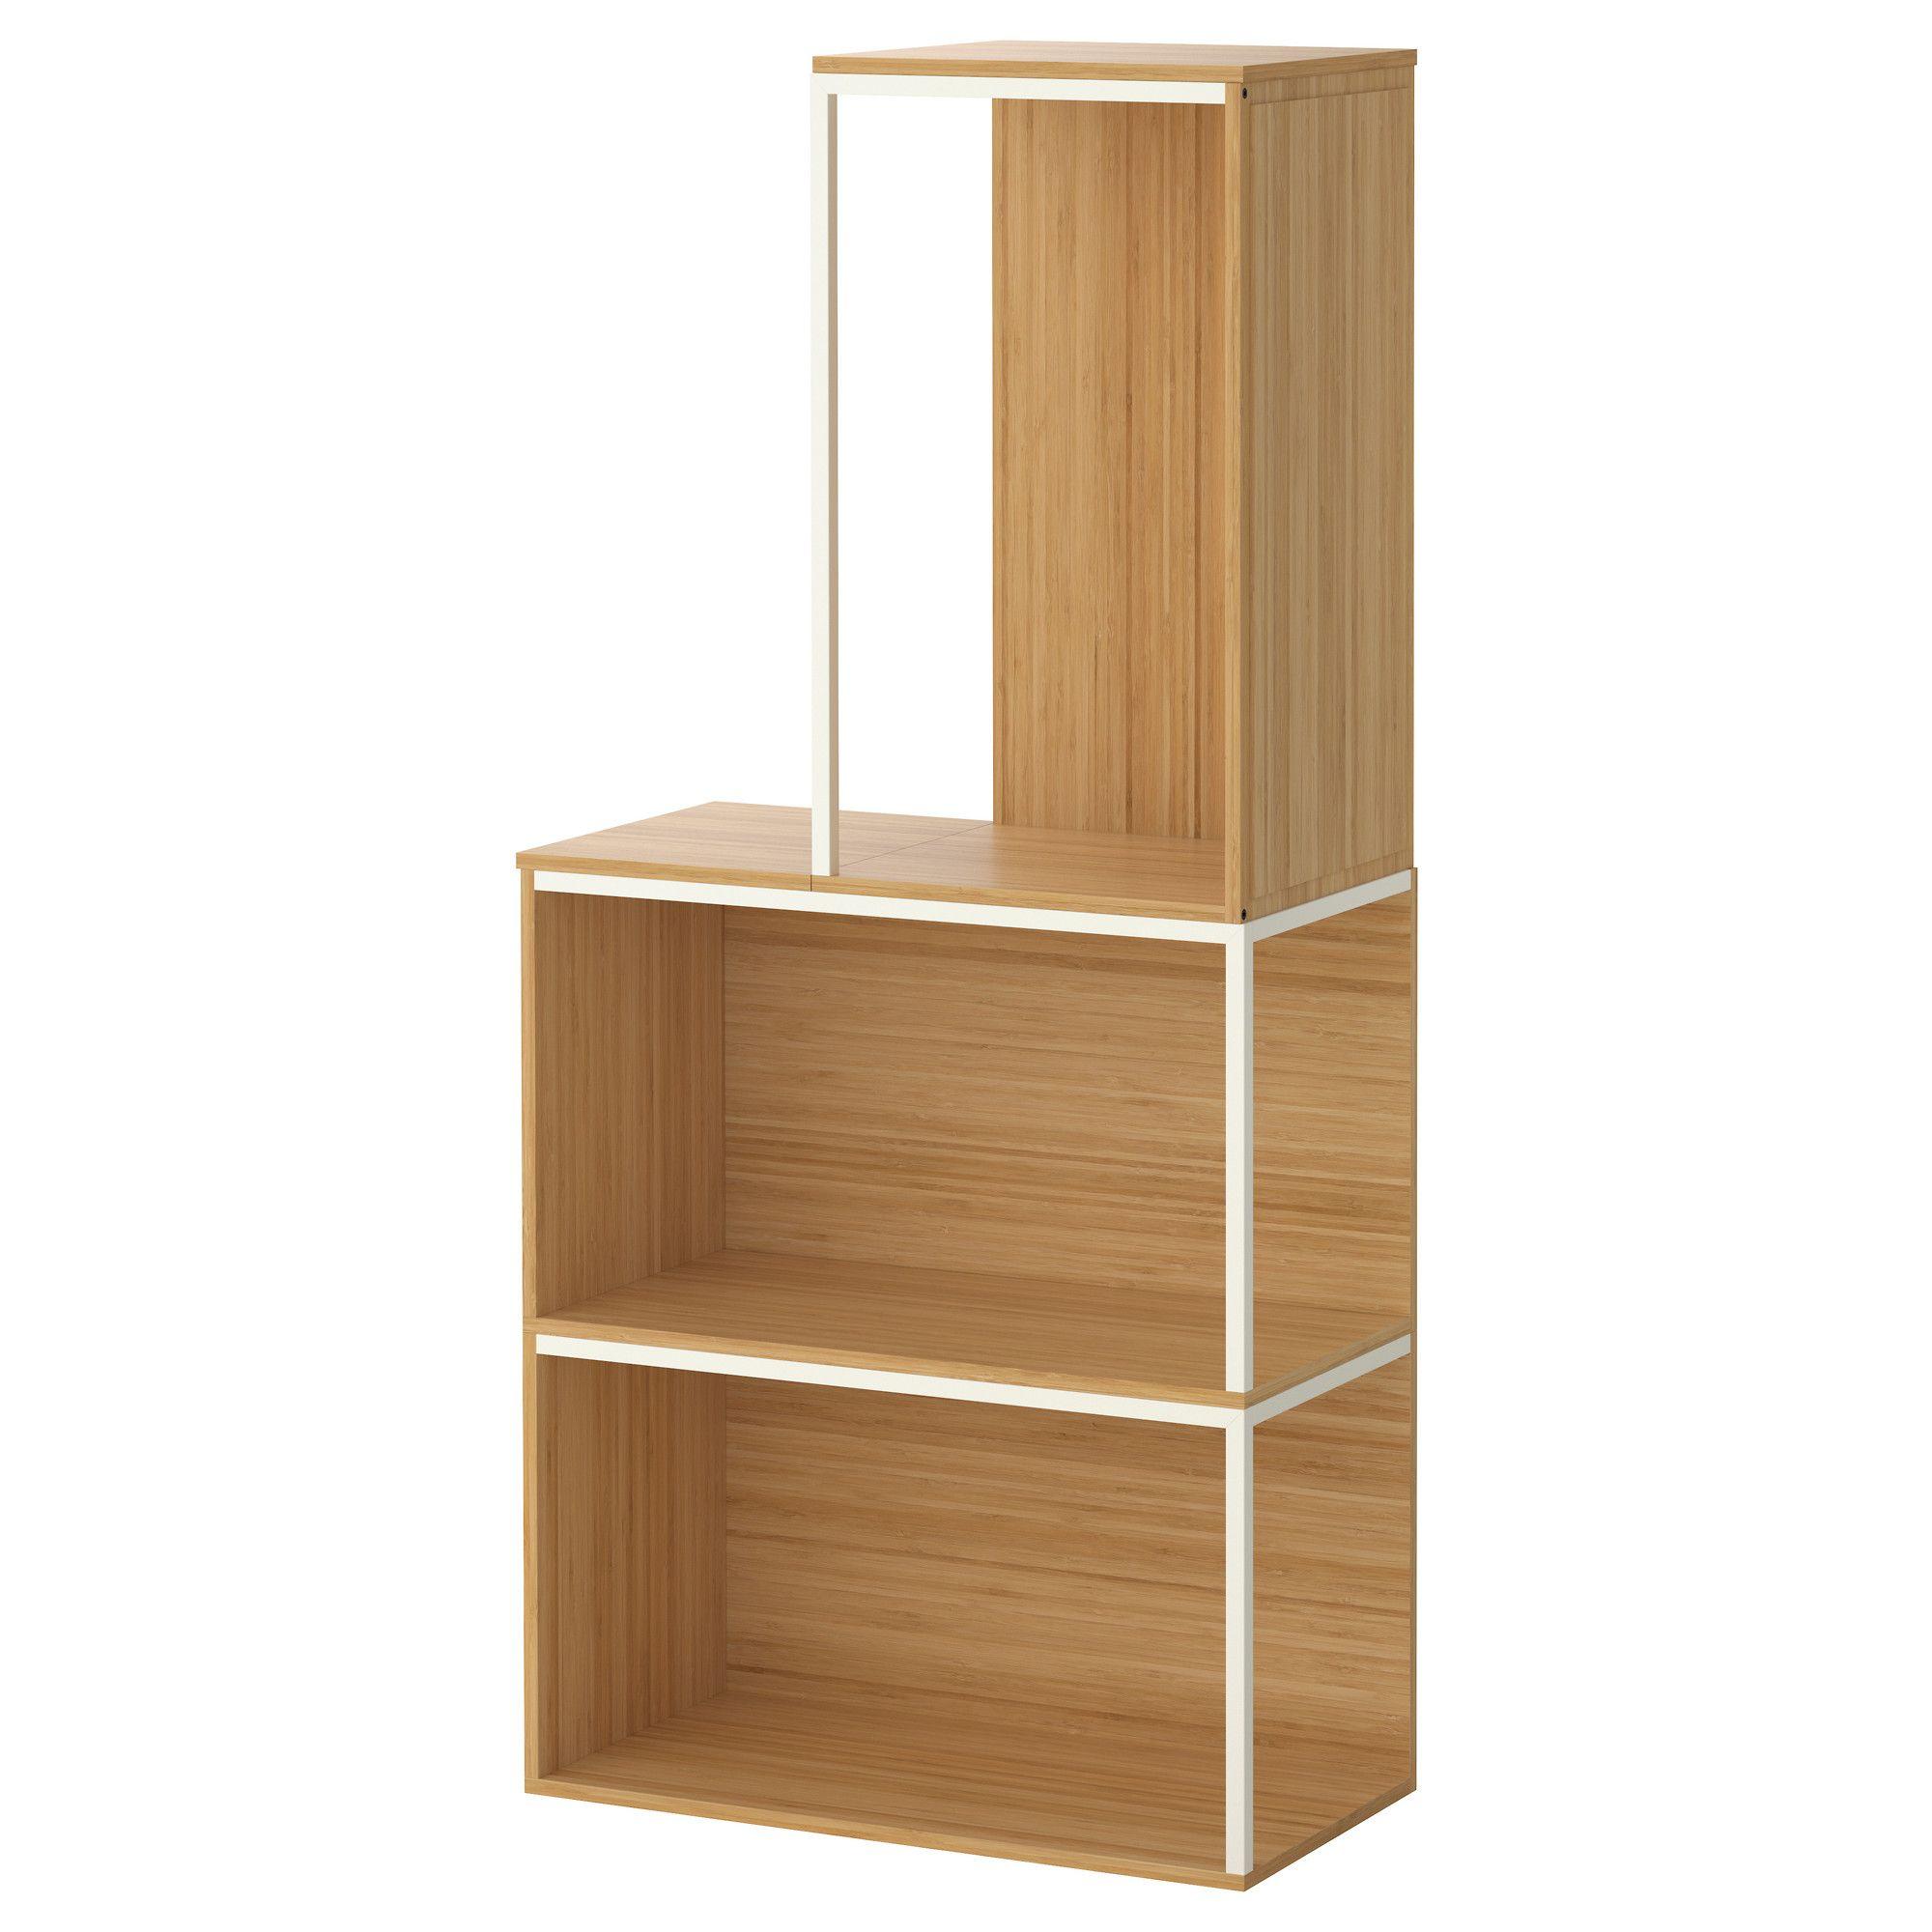 Ikea Wood Modules Shelves   Google Search Part 34